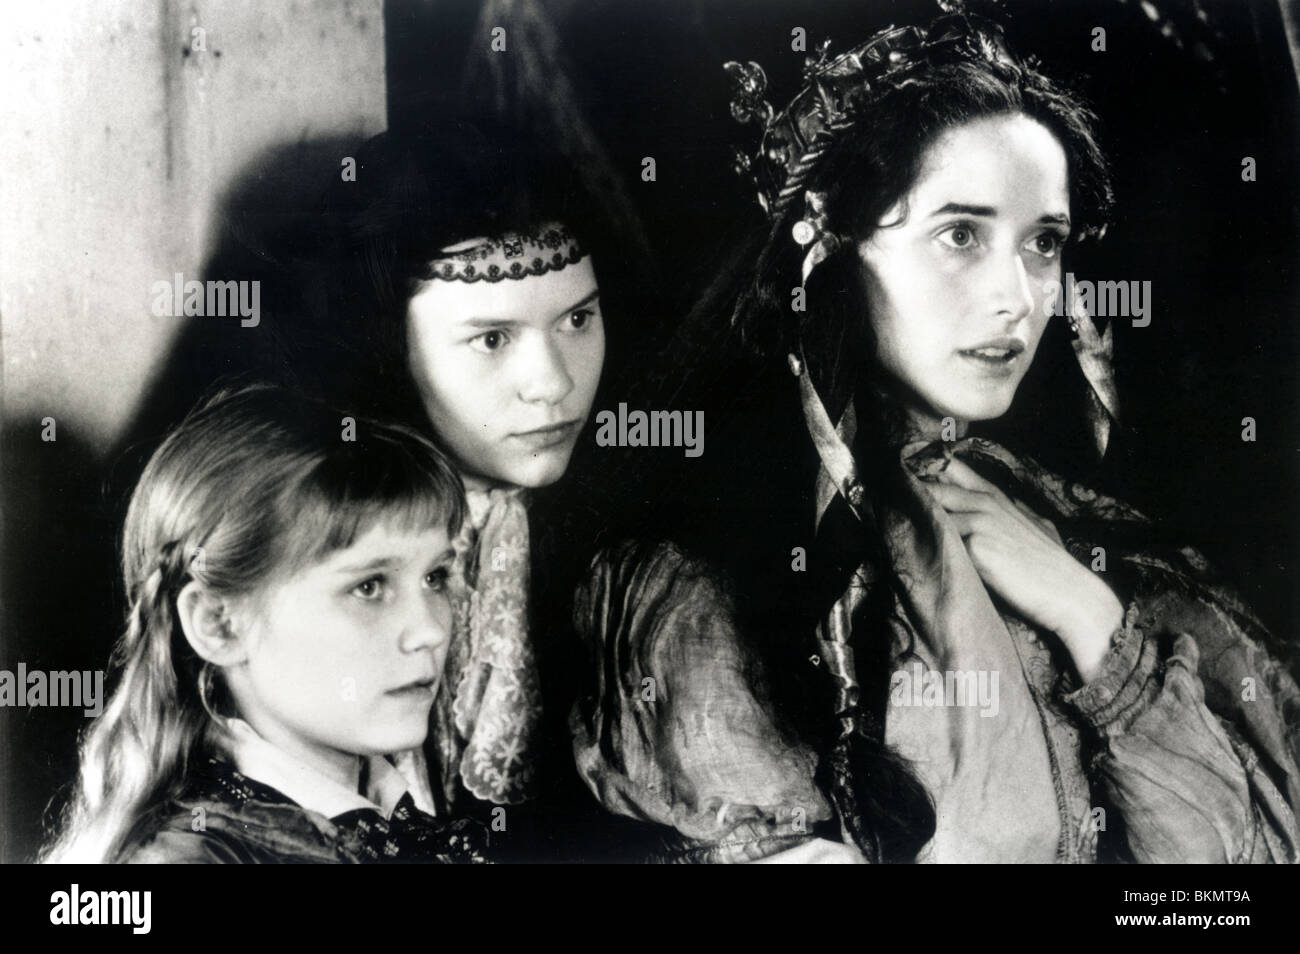 little women 1994 kirsten dunst claire danes trini